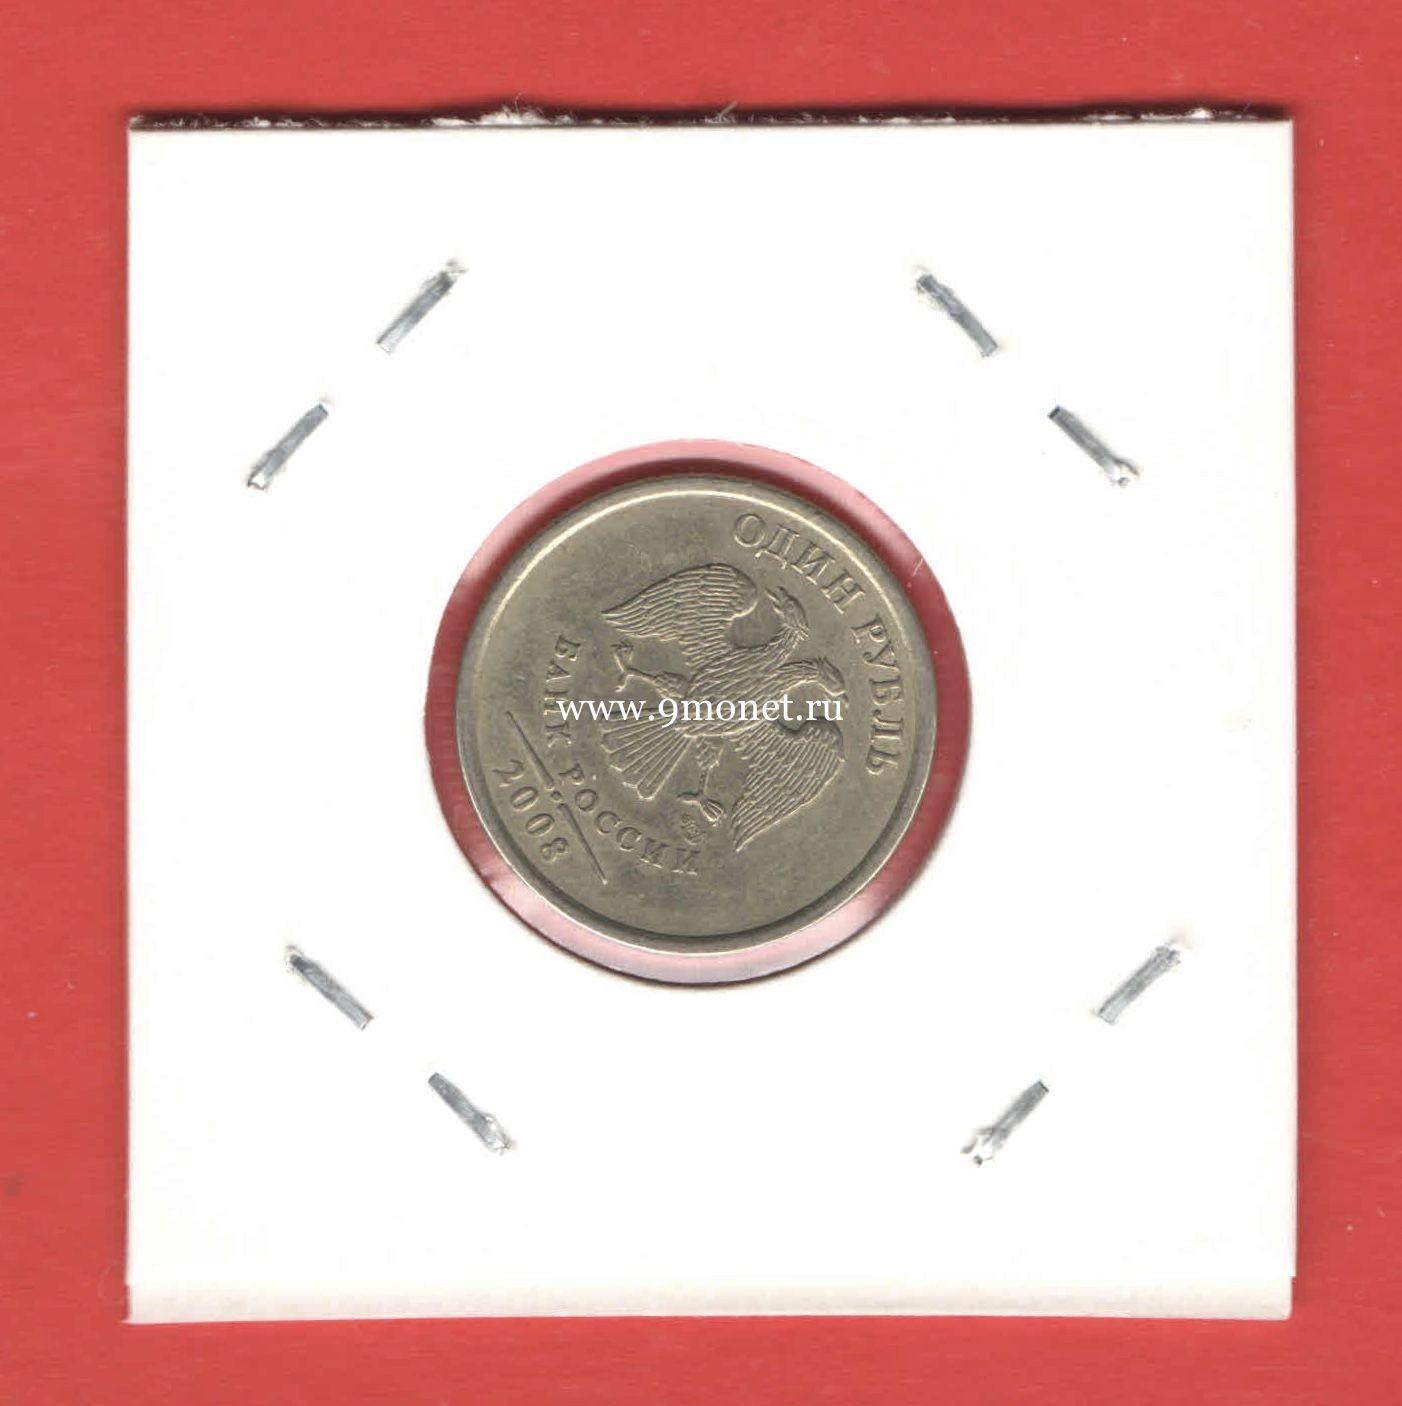 Россия монета с браком 1 рубль 2008 года СПМД. (поворот)